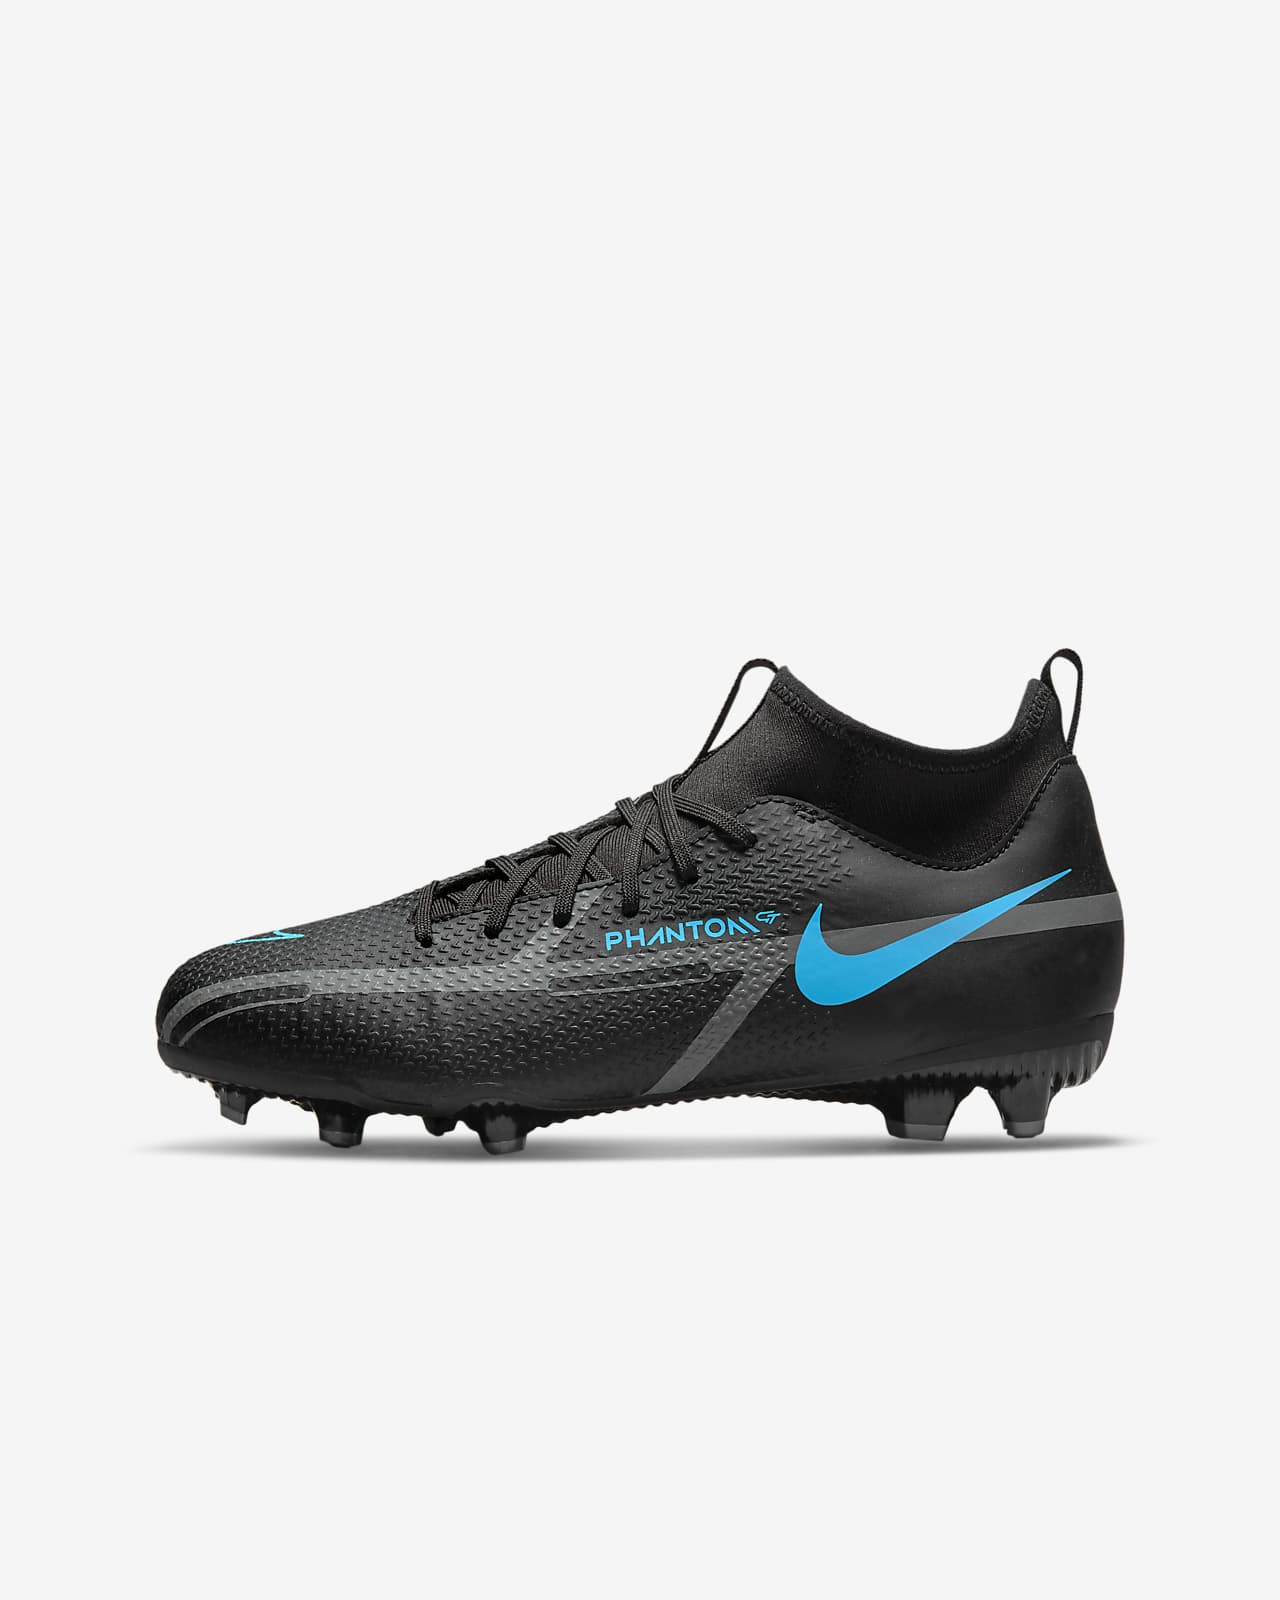 Nike Jr. Phantom GT2 Academy Dynamic Fit MG Voetbalschoen voor kleuters/kids (meerdere ondergronden)